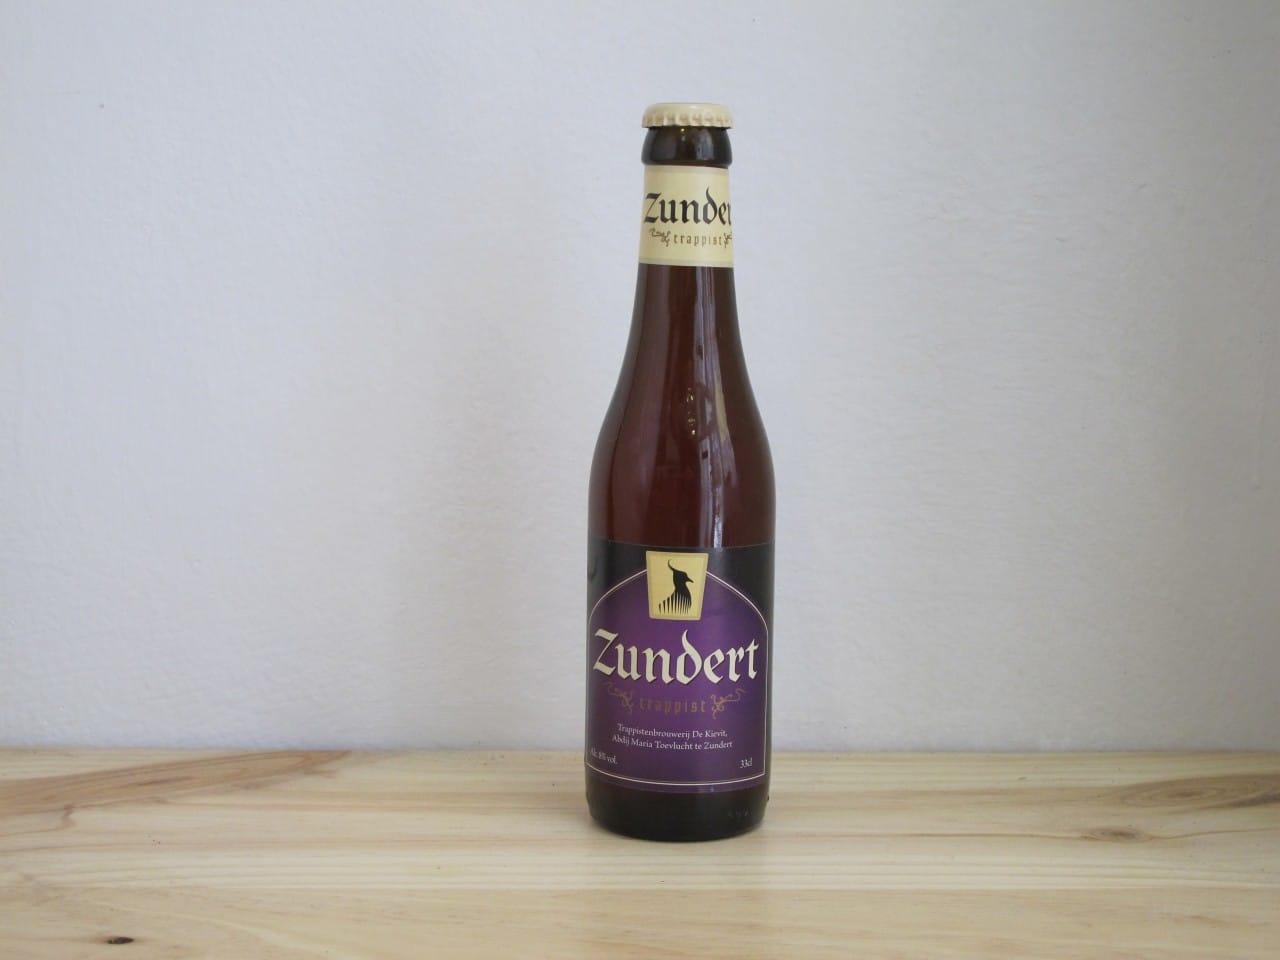 Cerveza Zundert